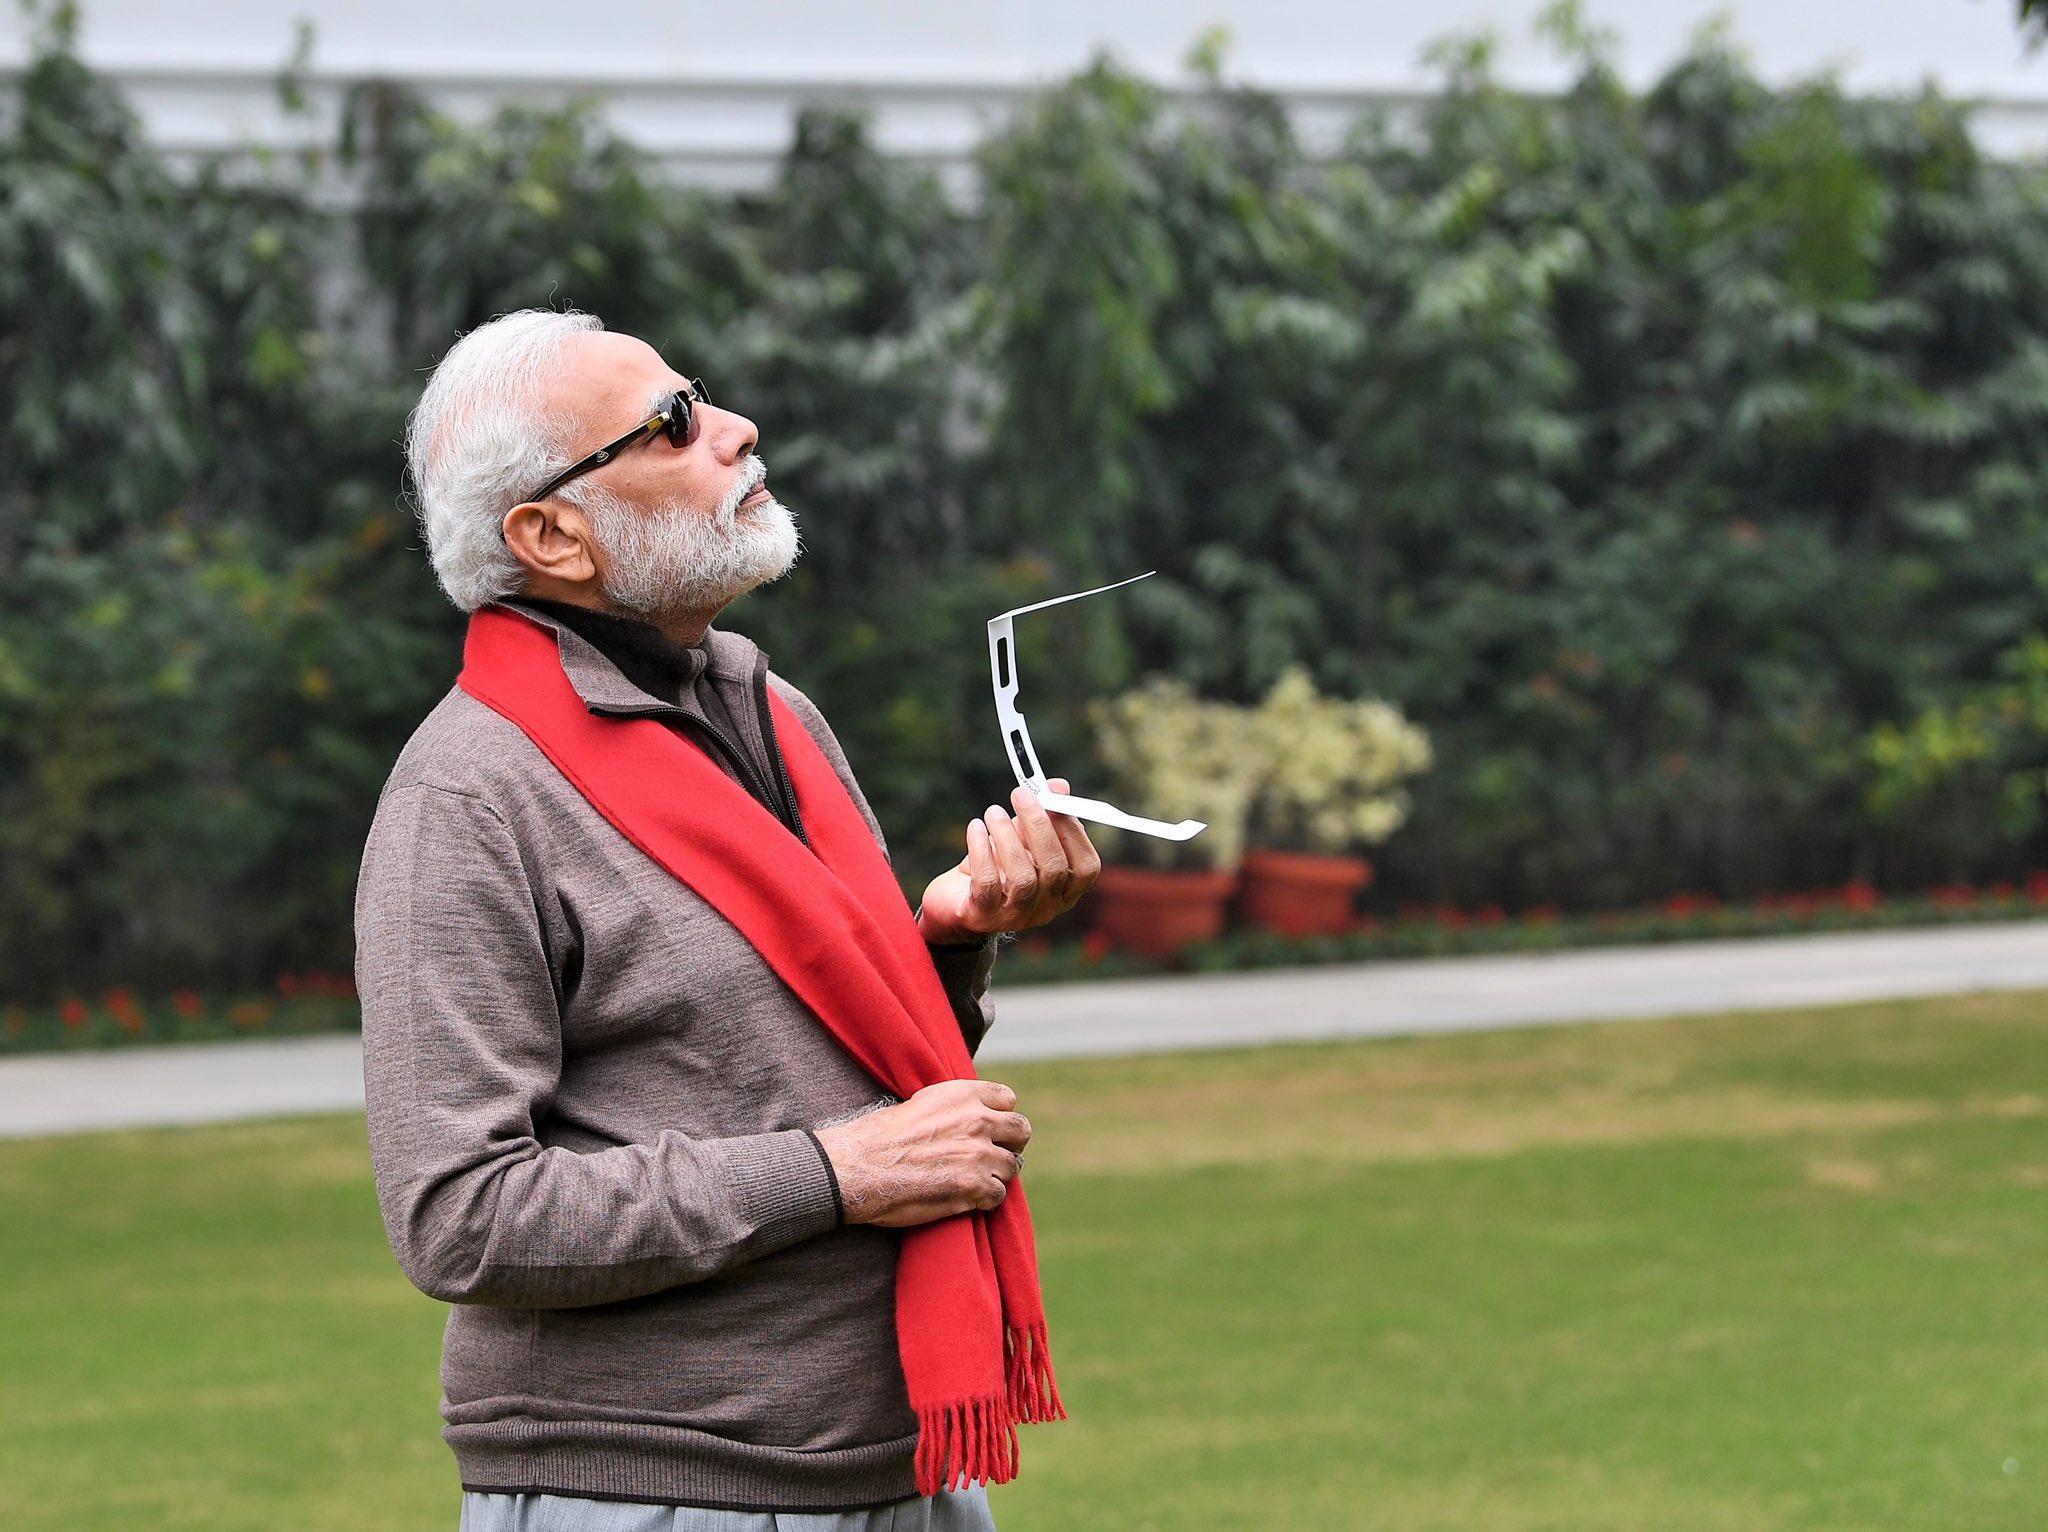 Modi Sunglasses